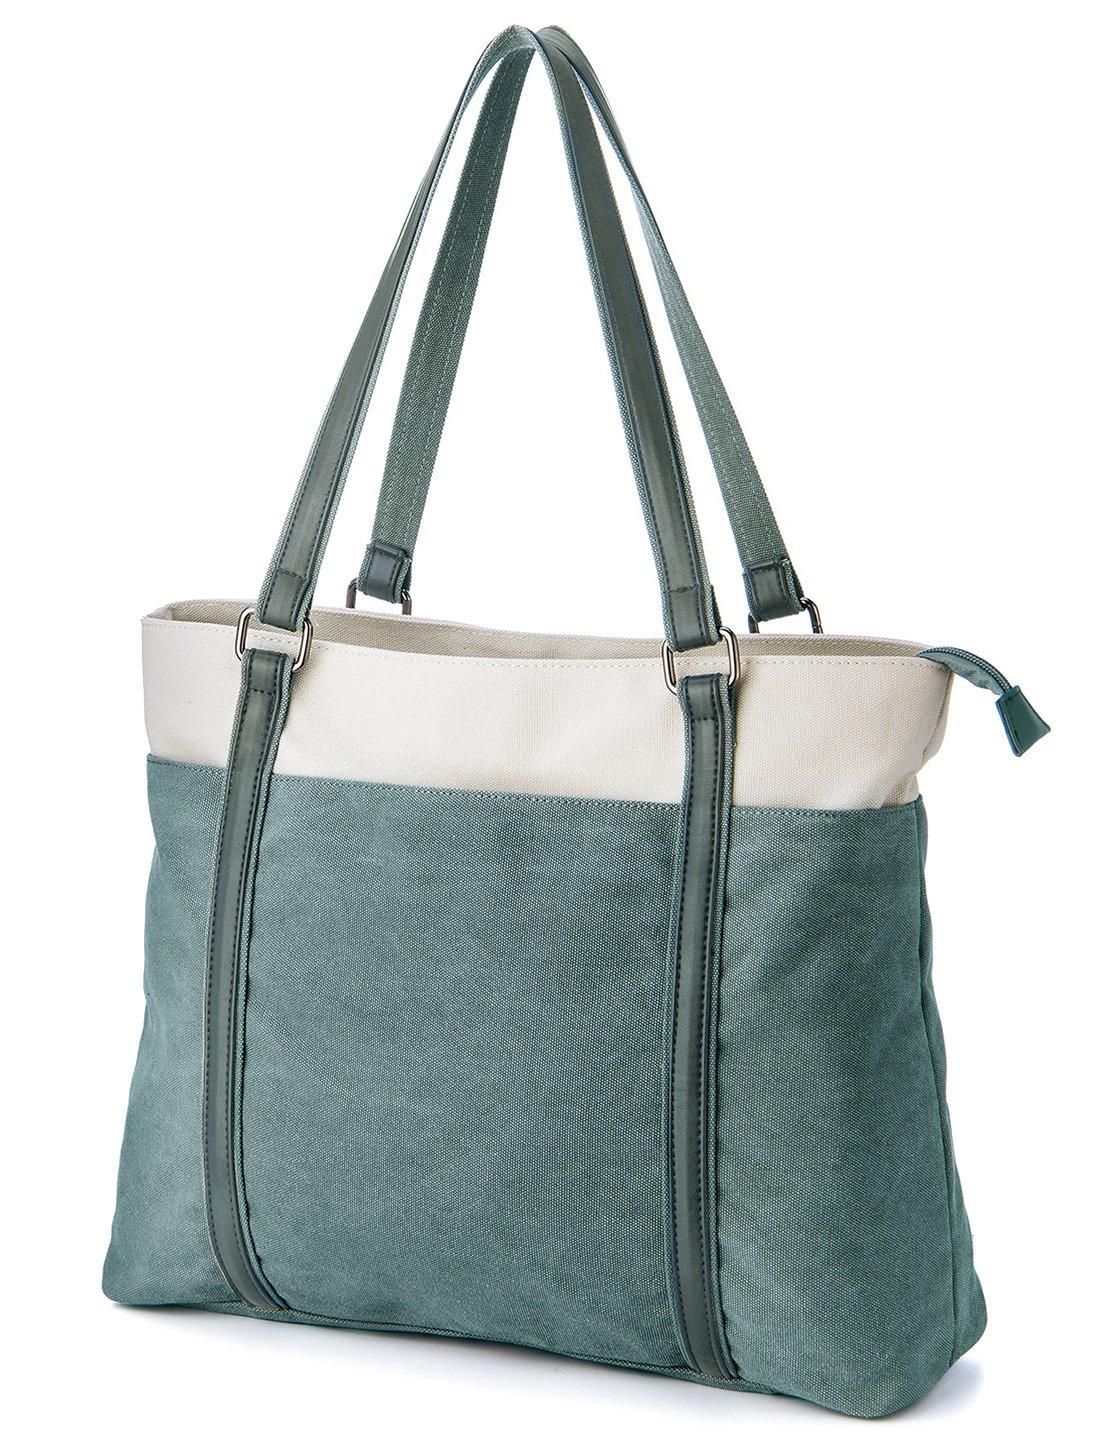 Laptop Tote Bag, GRM Canvas Shoulder Bag, Carrying Handbag for Laptop up to 15.6 inch, Travel Computer Business Office Work School, Green